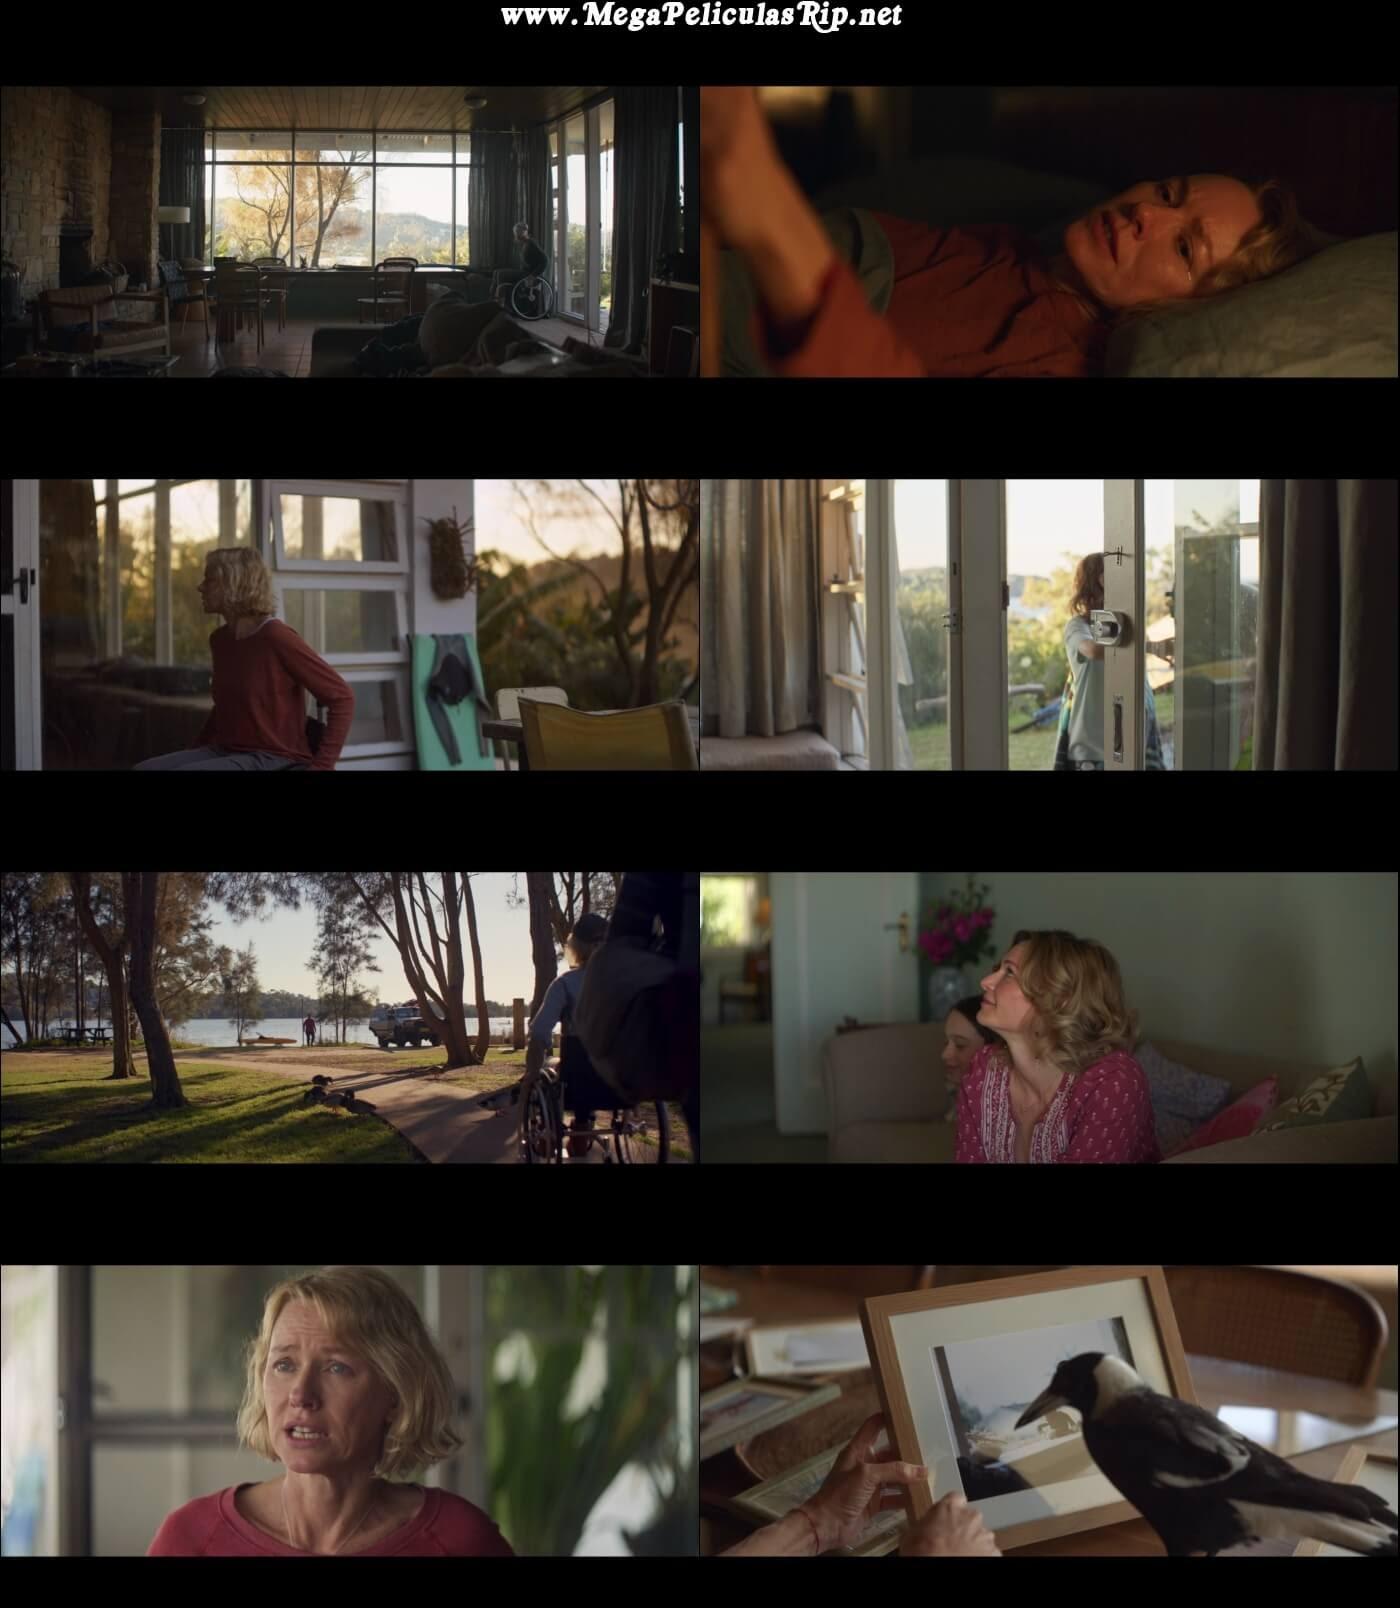 Un Milagro Inesperado 1080p Latino